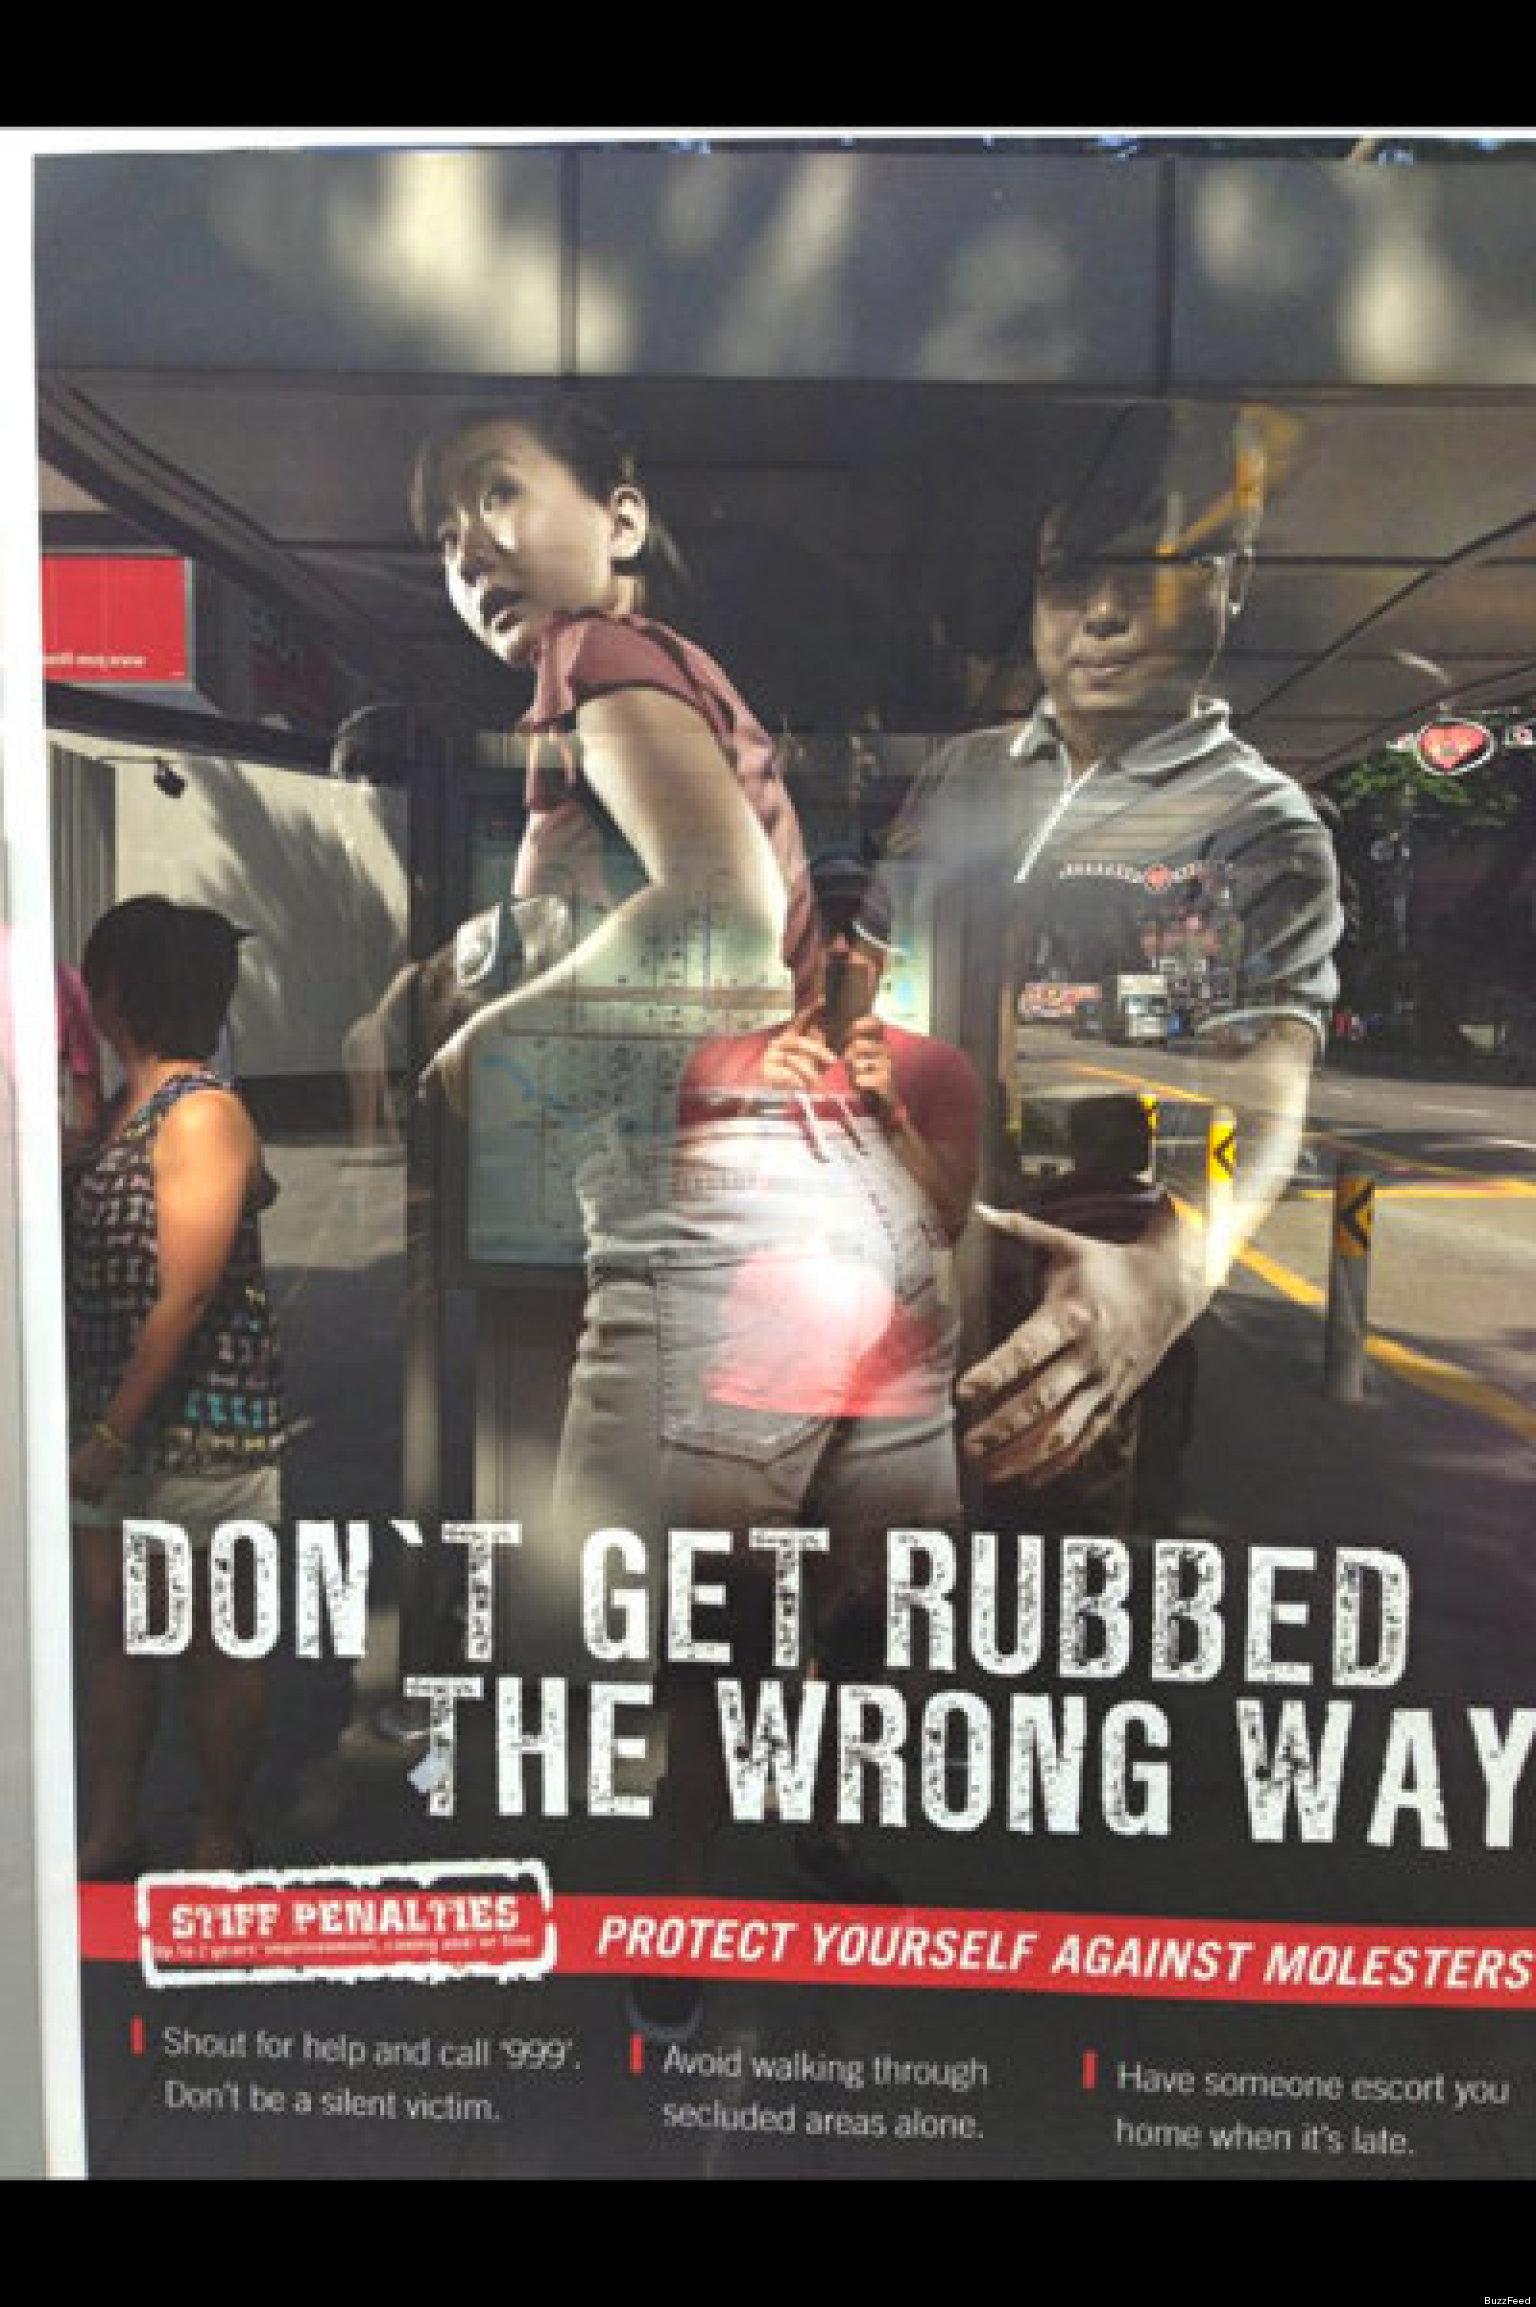 singapore anti-groping psa is seriously creepy | huffpost